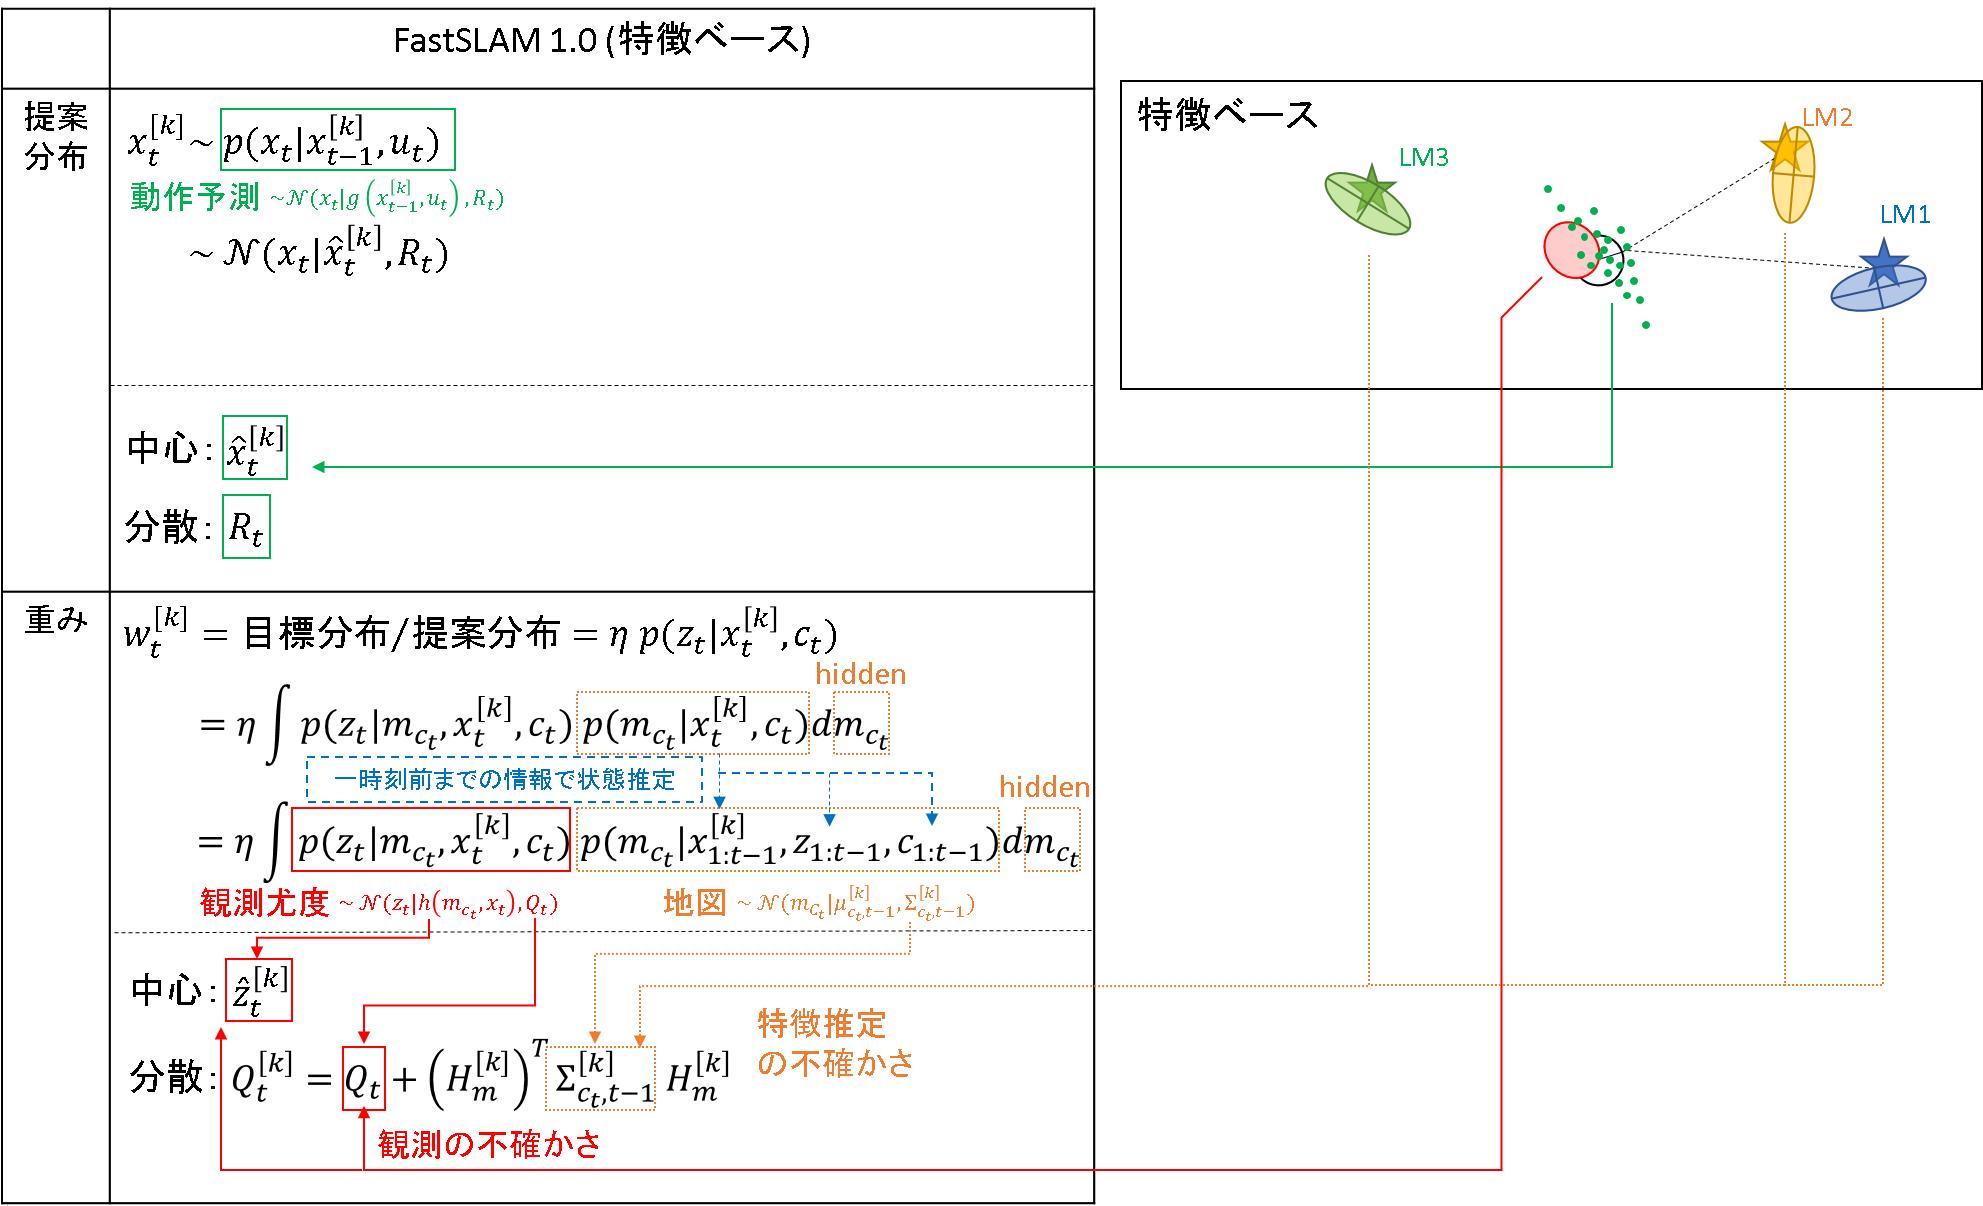 82_FastSLAM1.0_数式.png